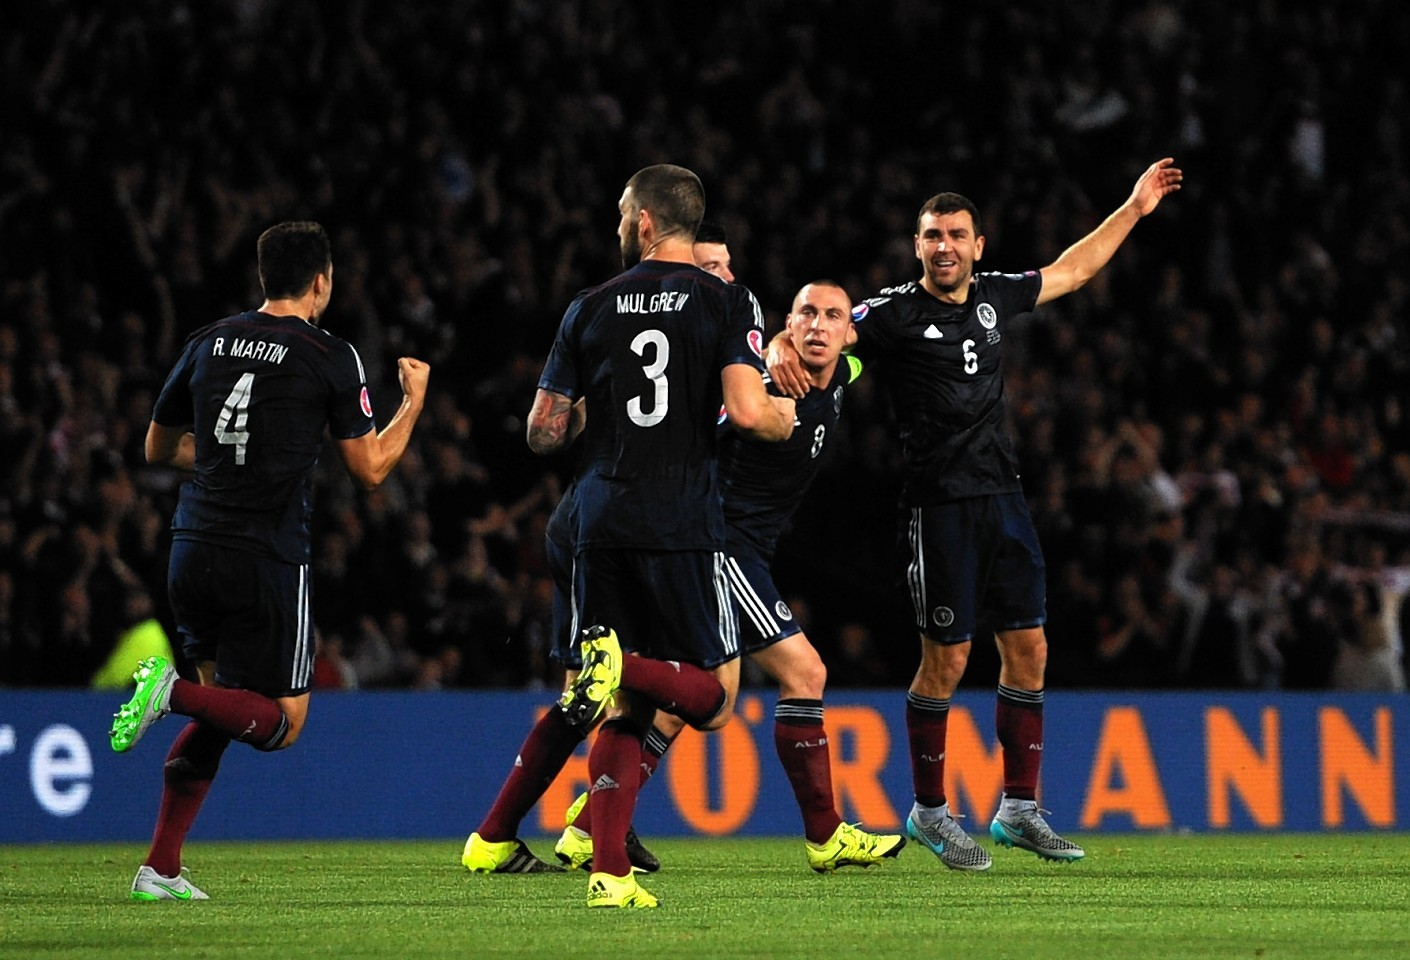 Scotland celebrating James McArthur's goal.